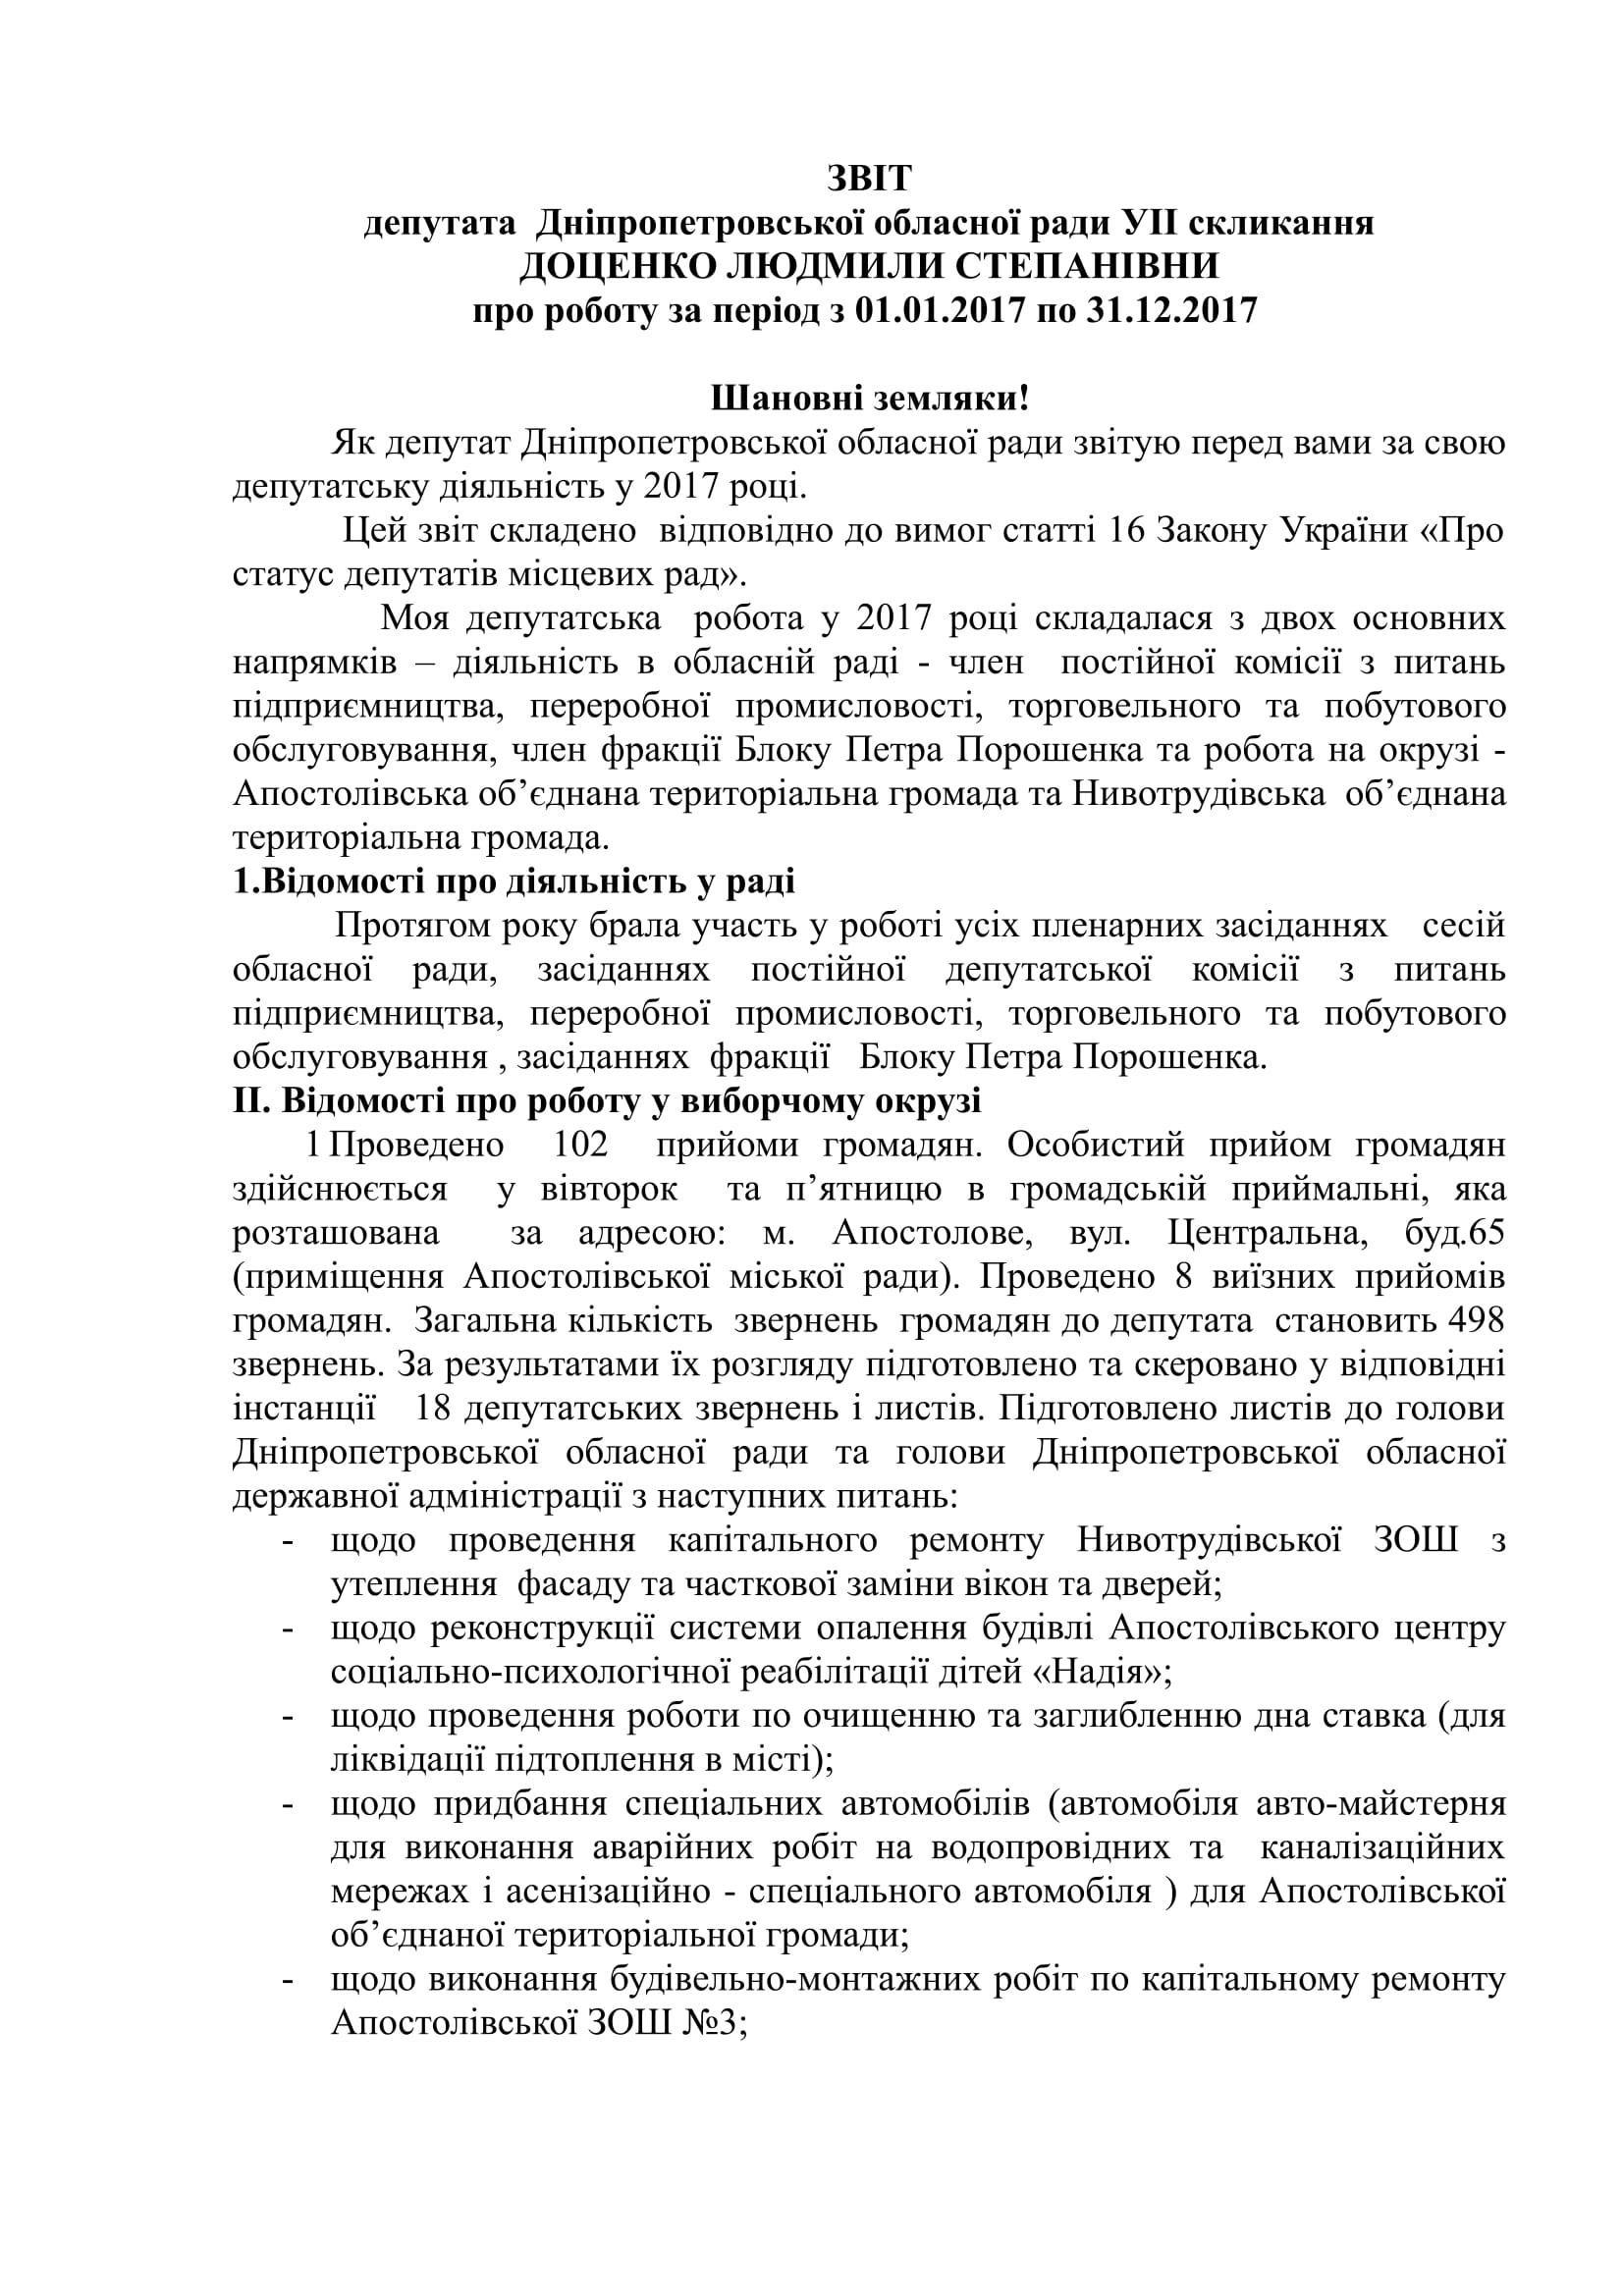 звіт 2 за 2017 рік Доценко Л.С.-1